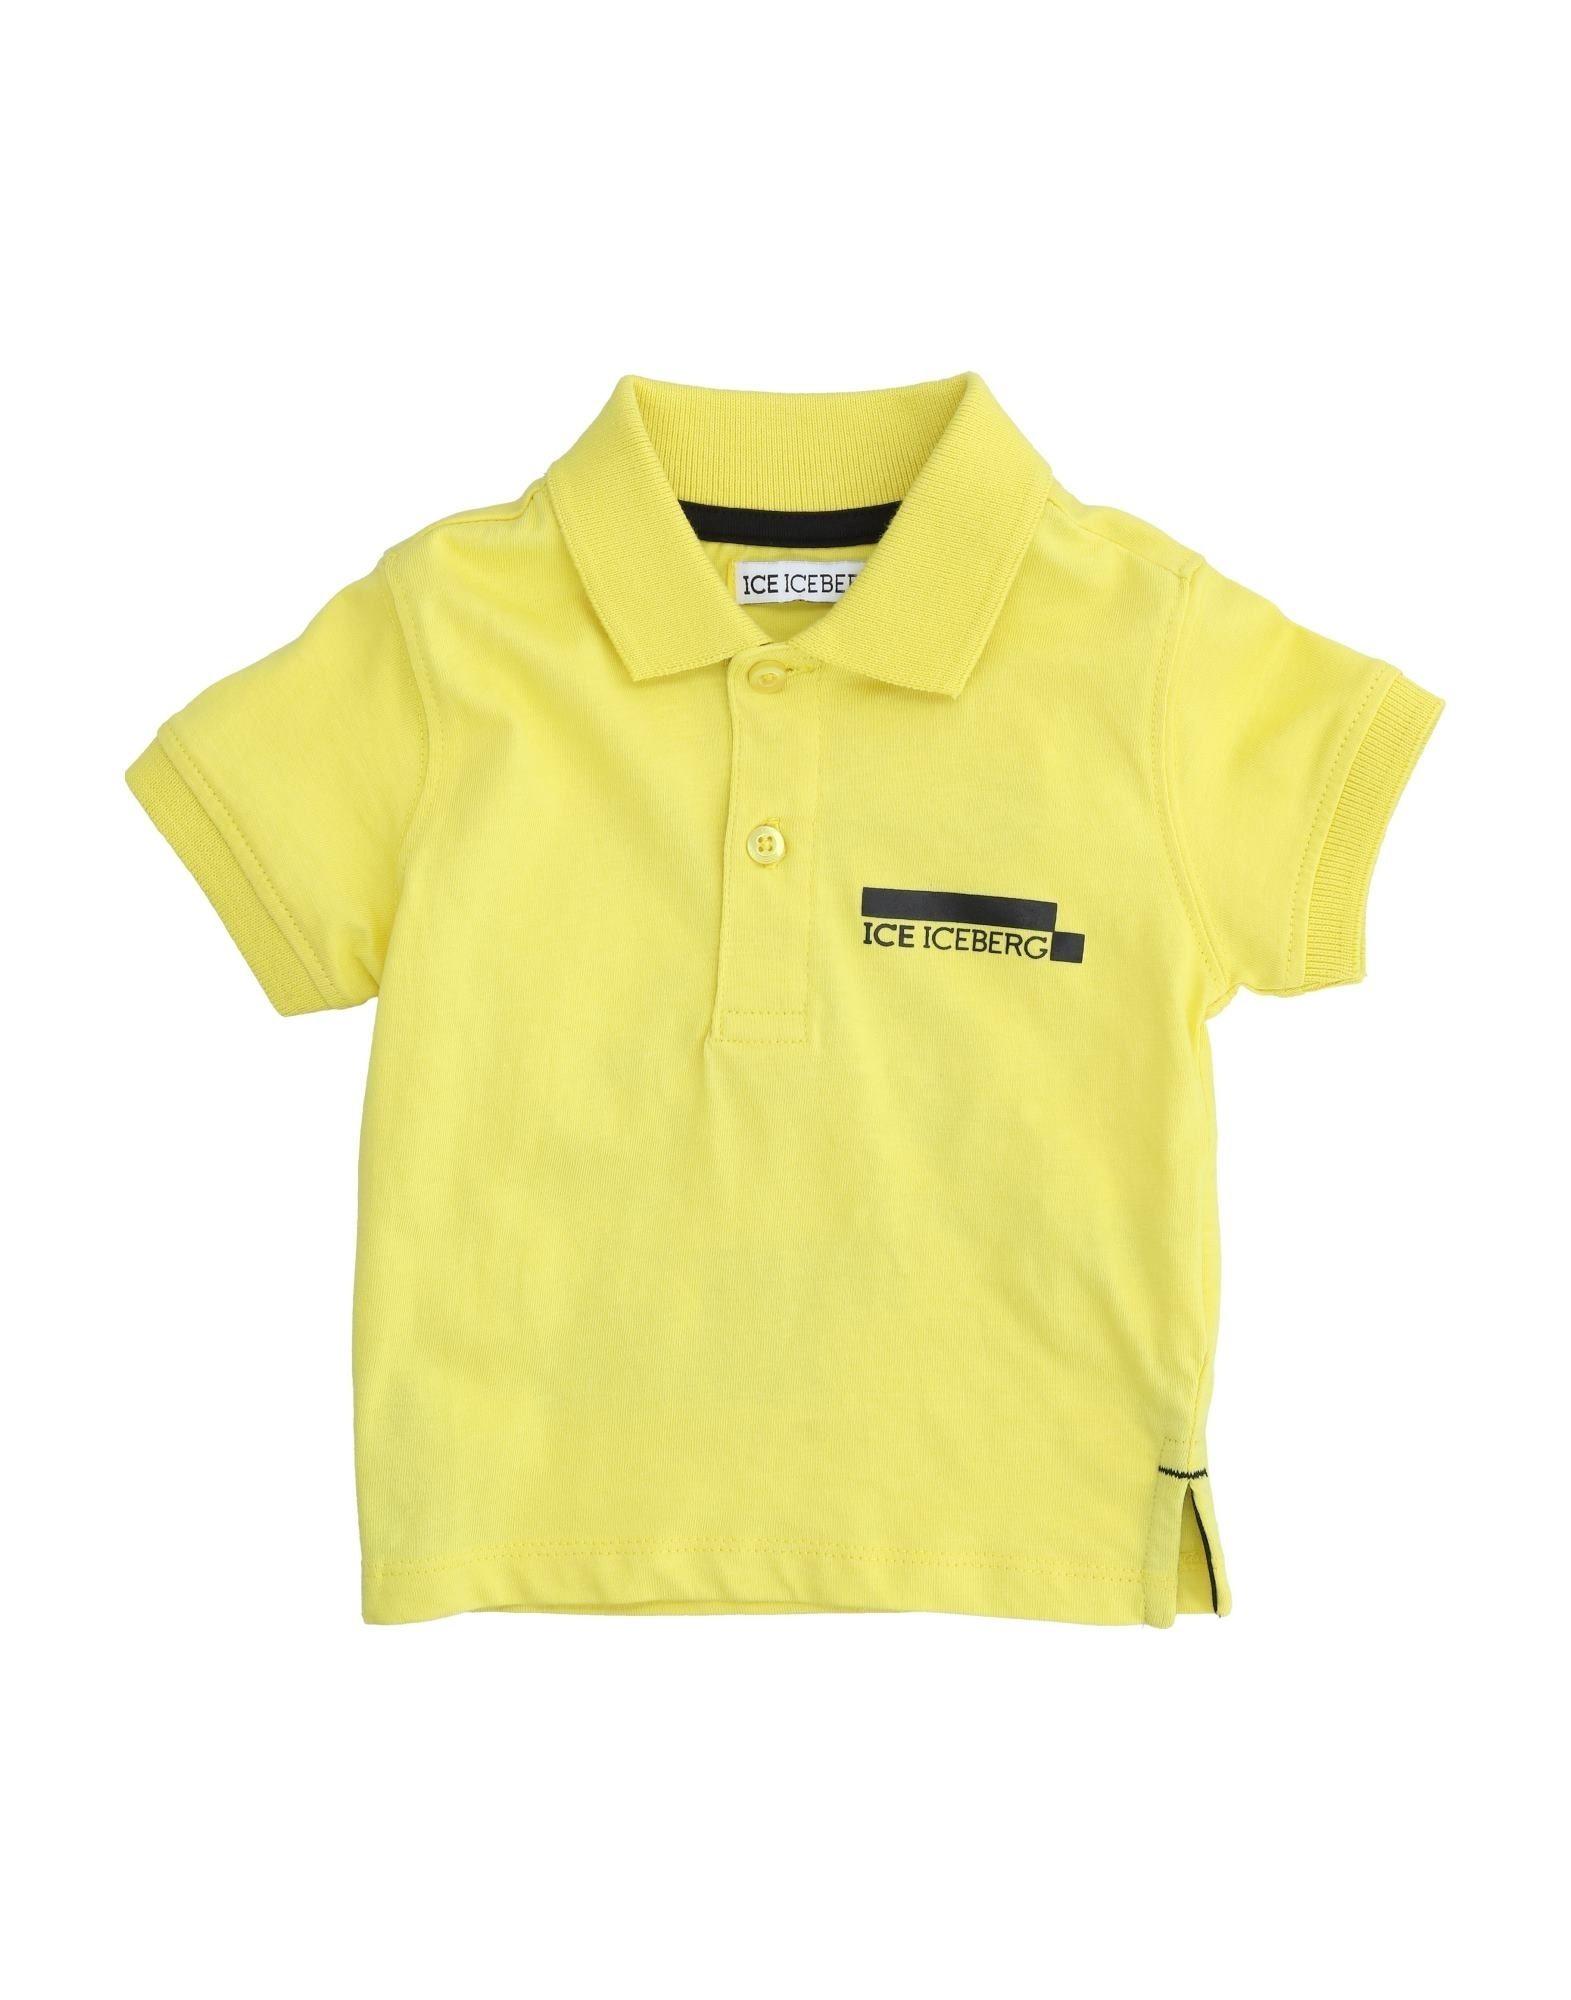 Ice Iceberg Kids' Polo Shirts In Yellow